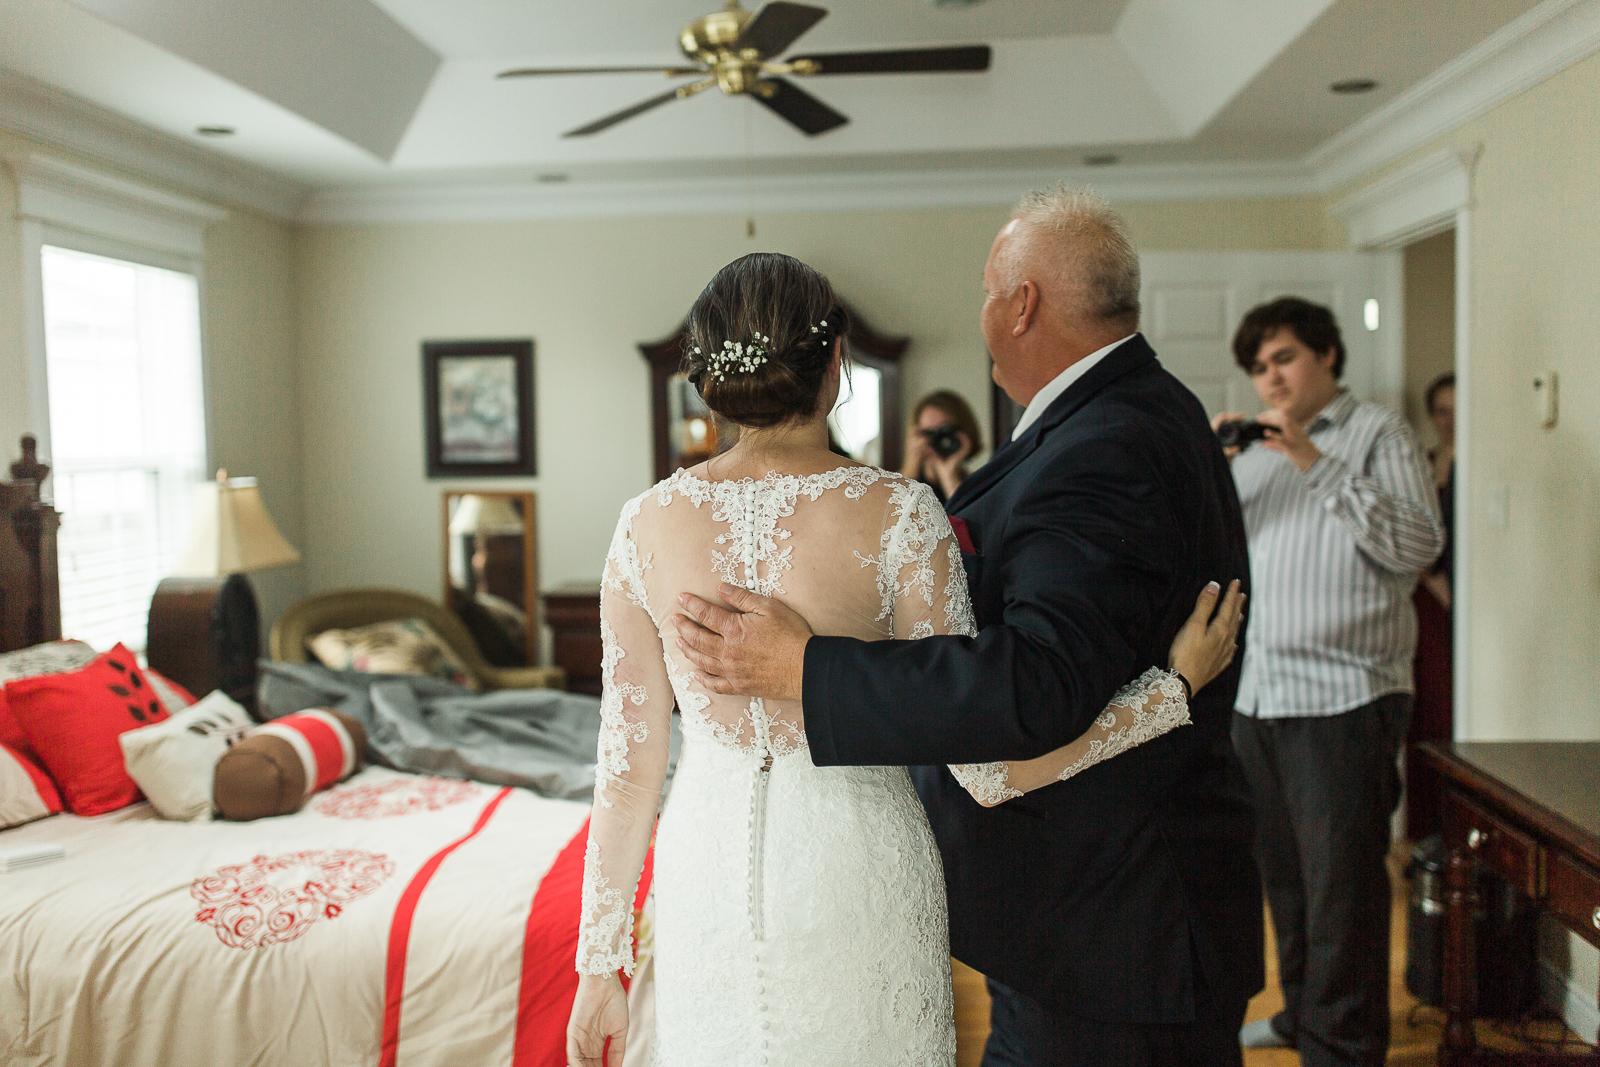 gander-wedding-photographer-32.jpg